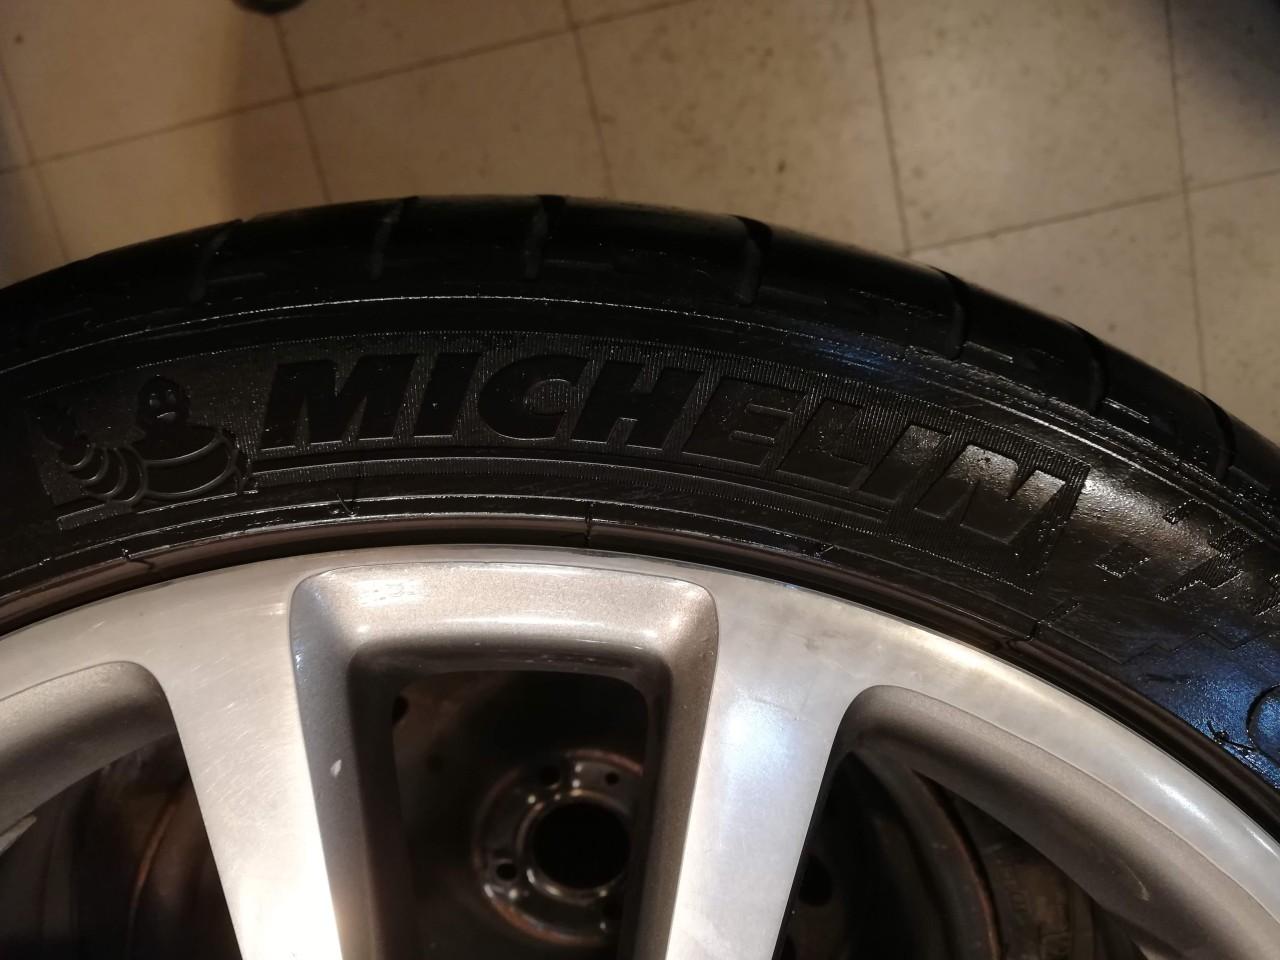 Anvelope vara 225 40 18 Good Year, Michelin, Firestone - 3 seturi